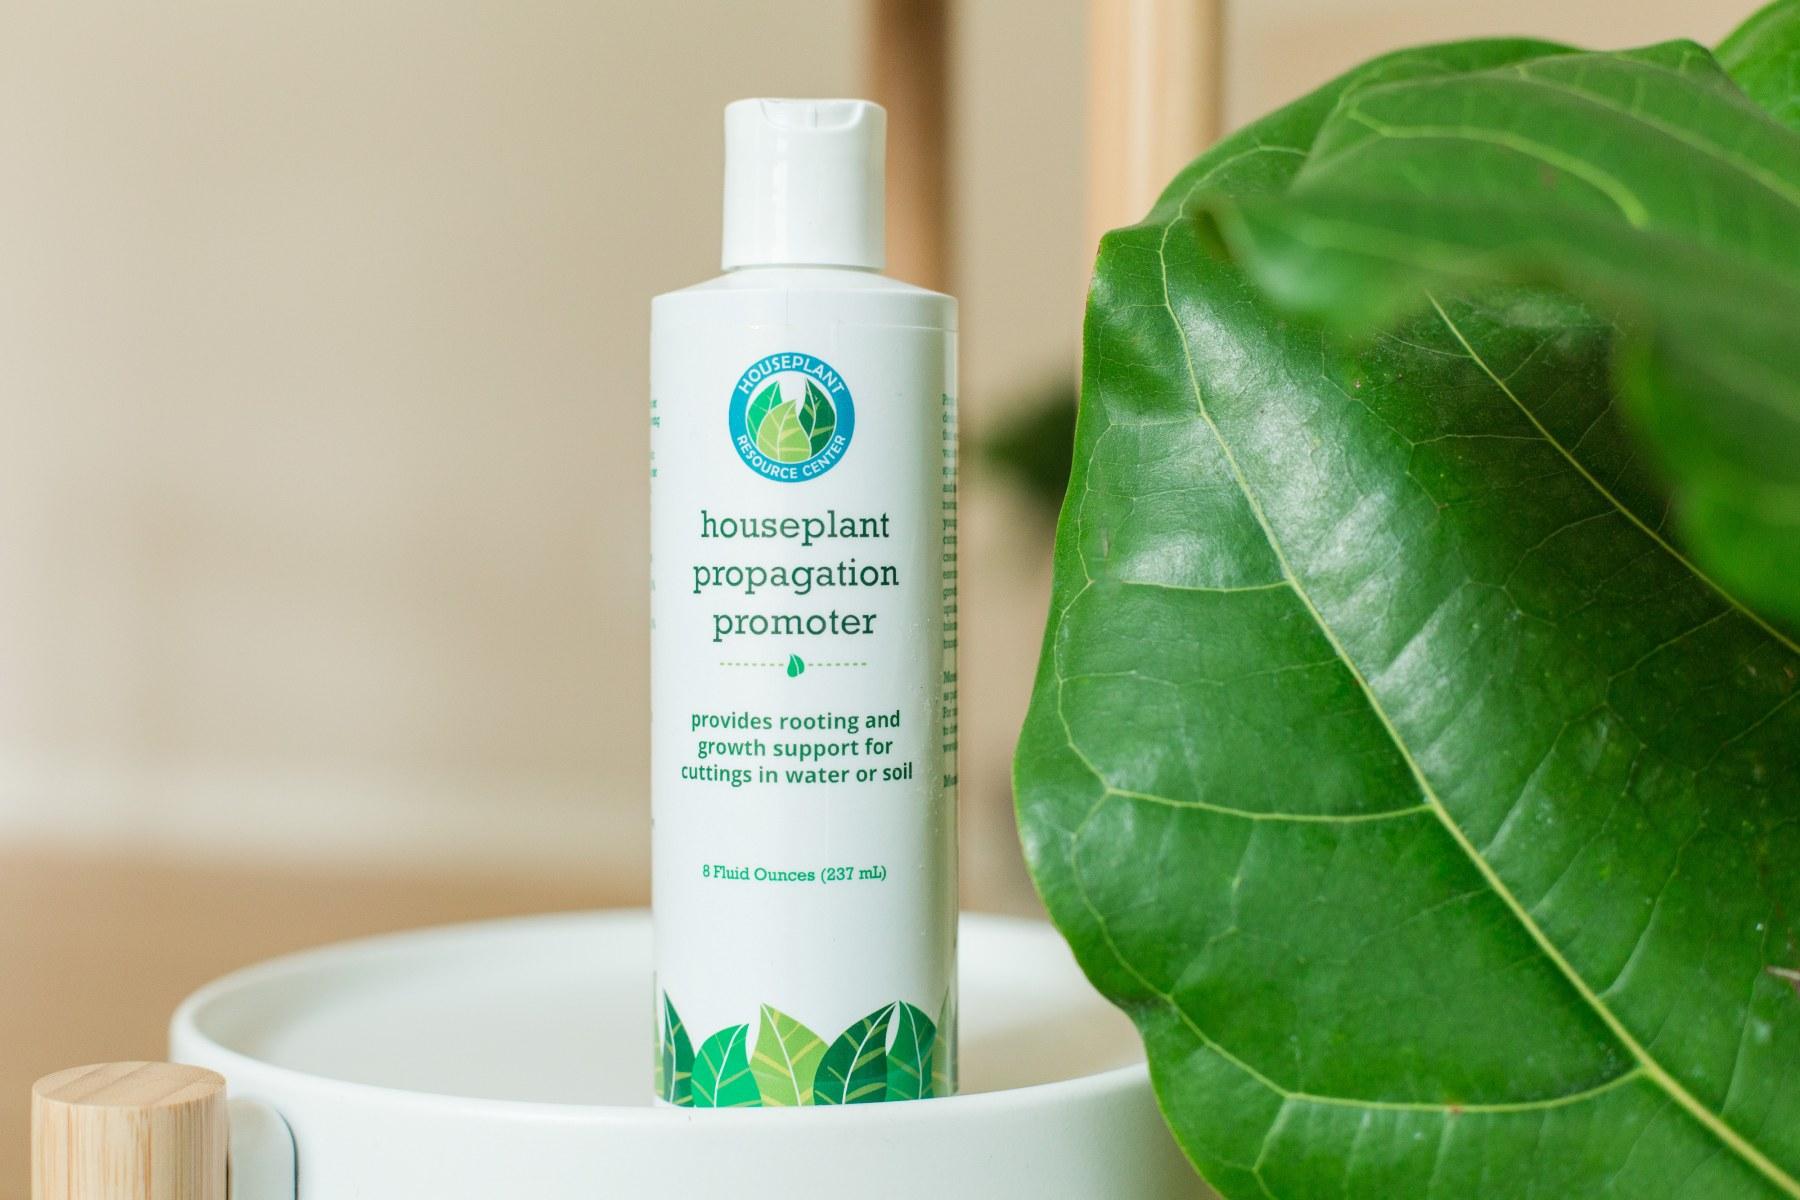 Houseplant-Propagation-Promoter-1